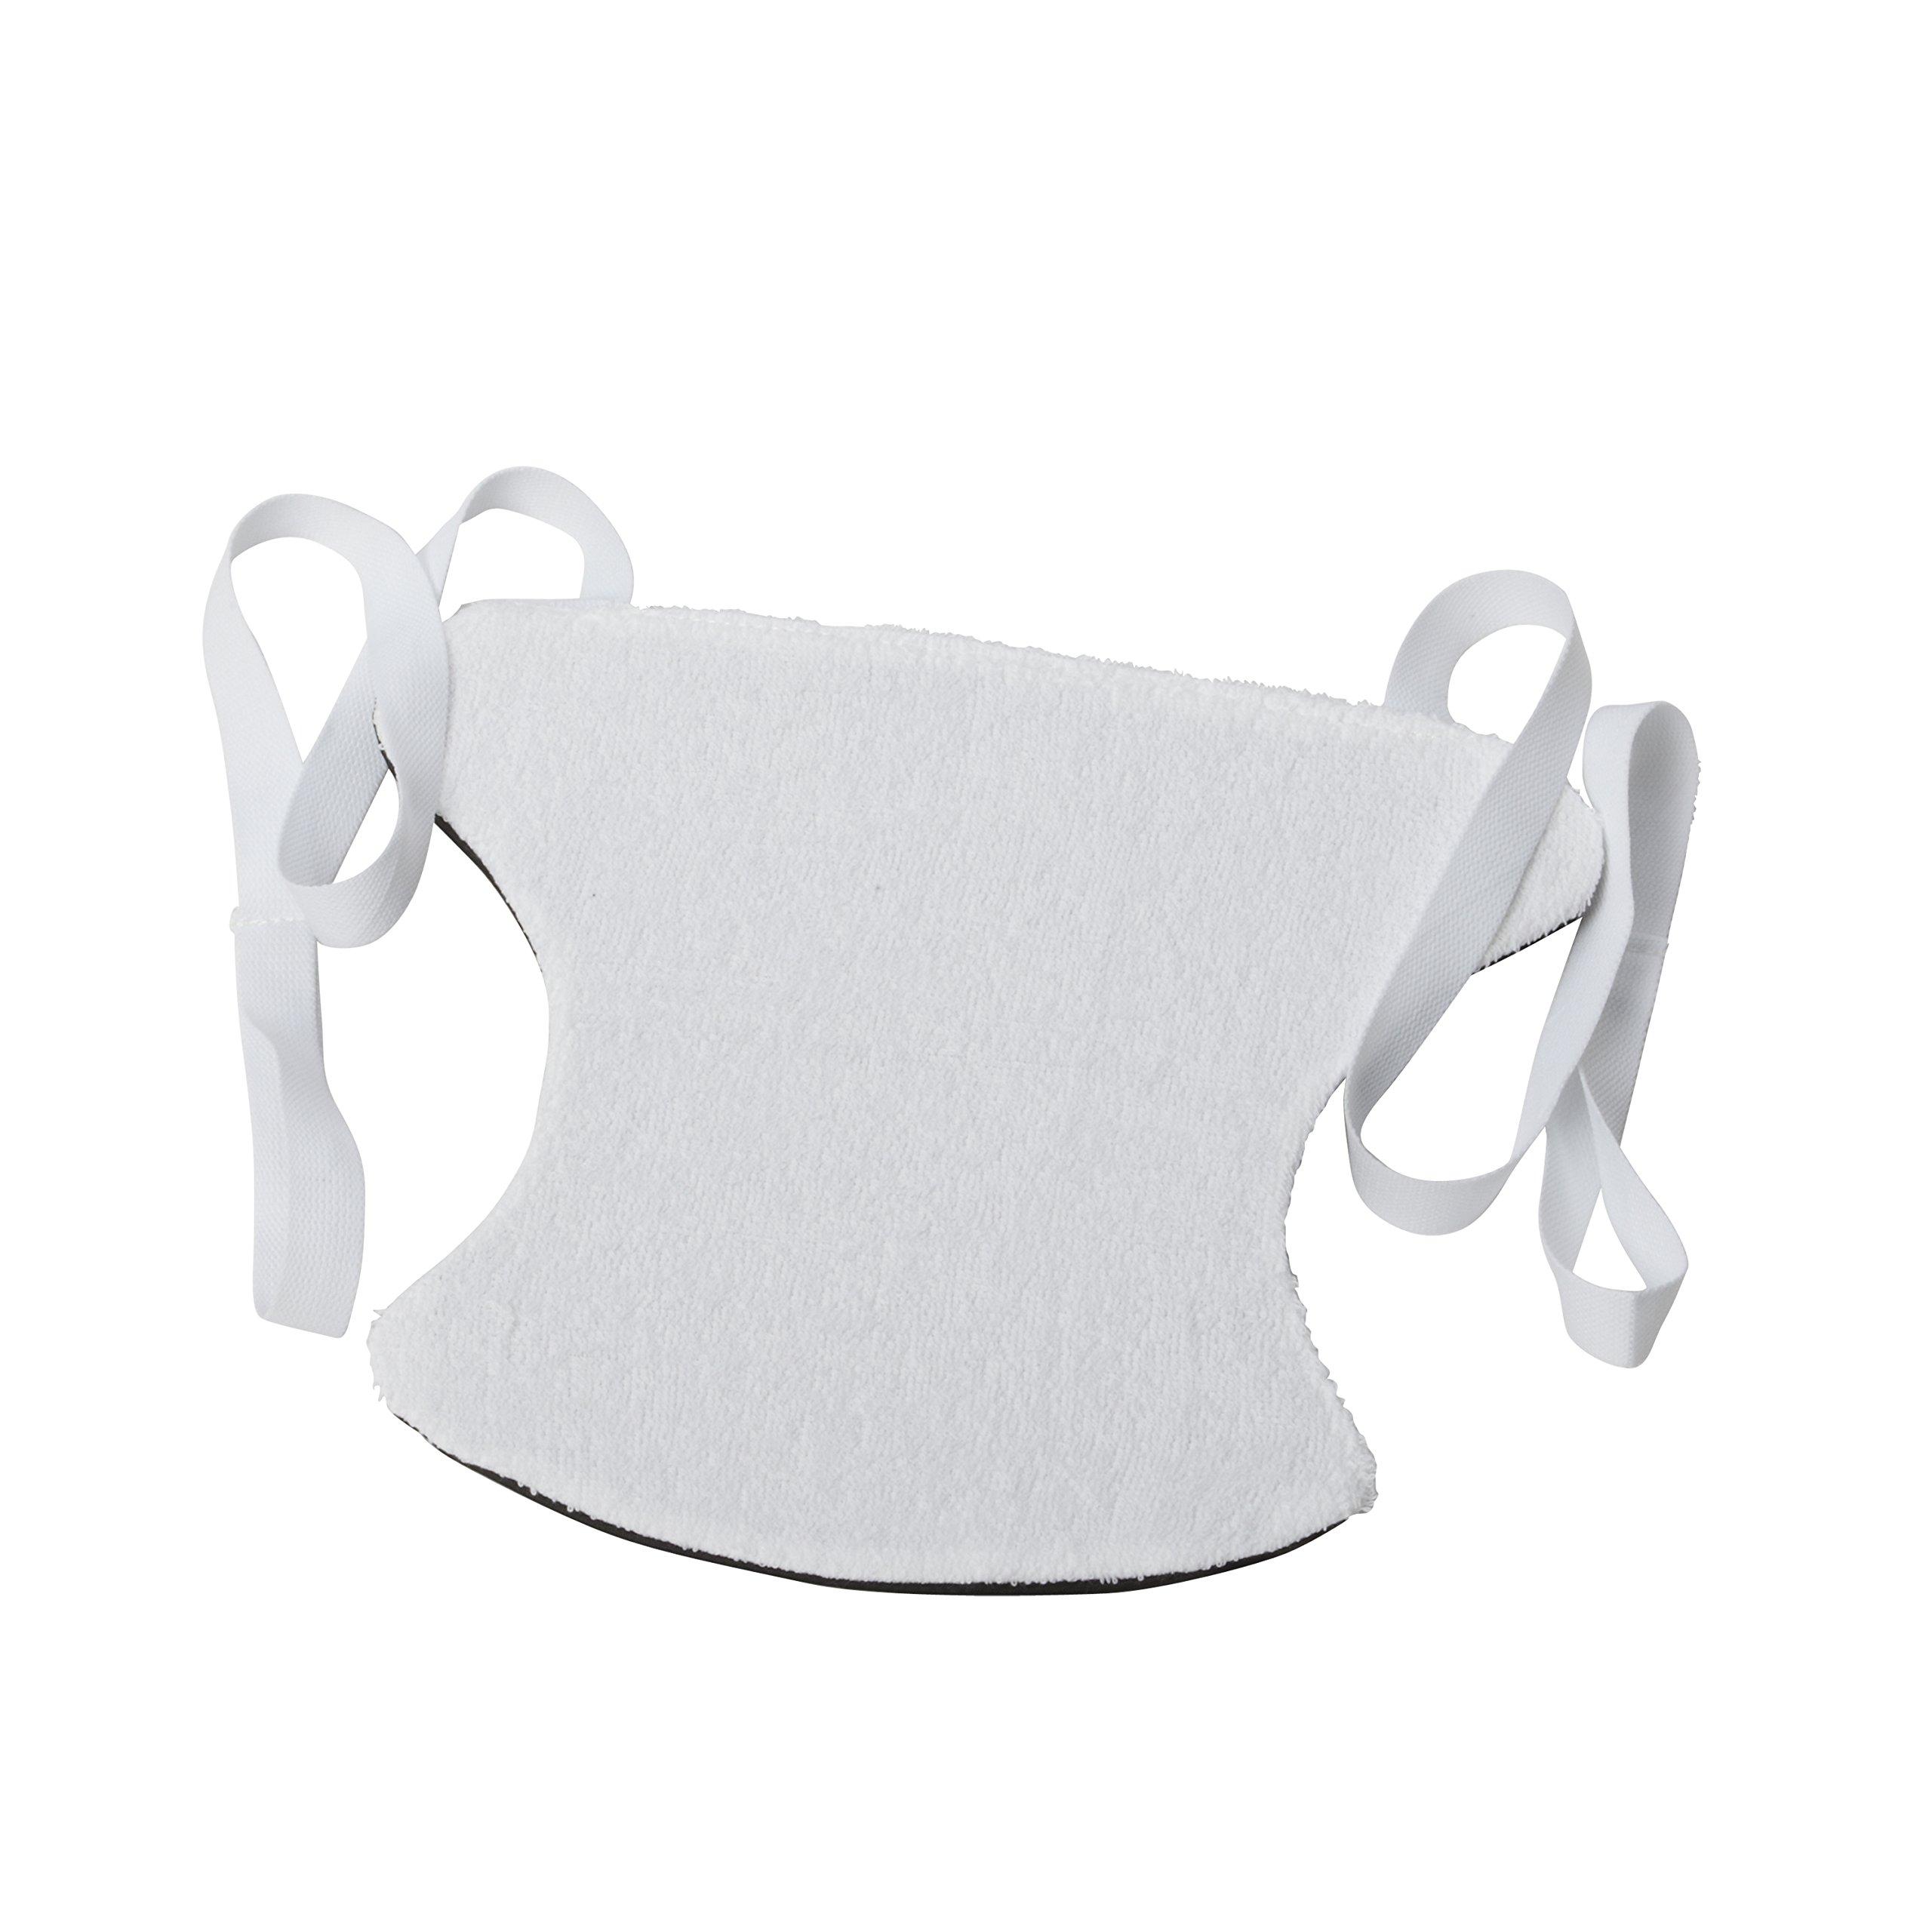 DMI Deluxe No Bend Sock Aid to Easily Pull on Socks, Slip Resistance, White